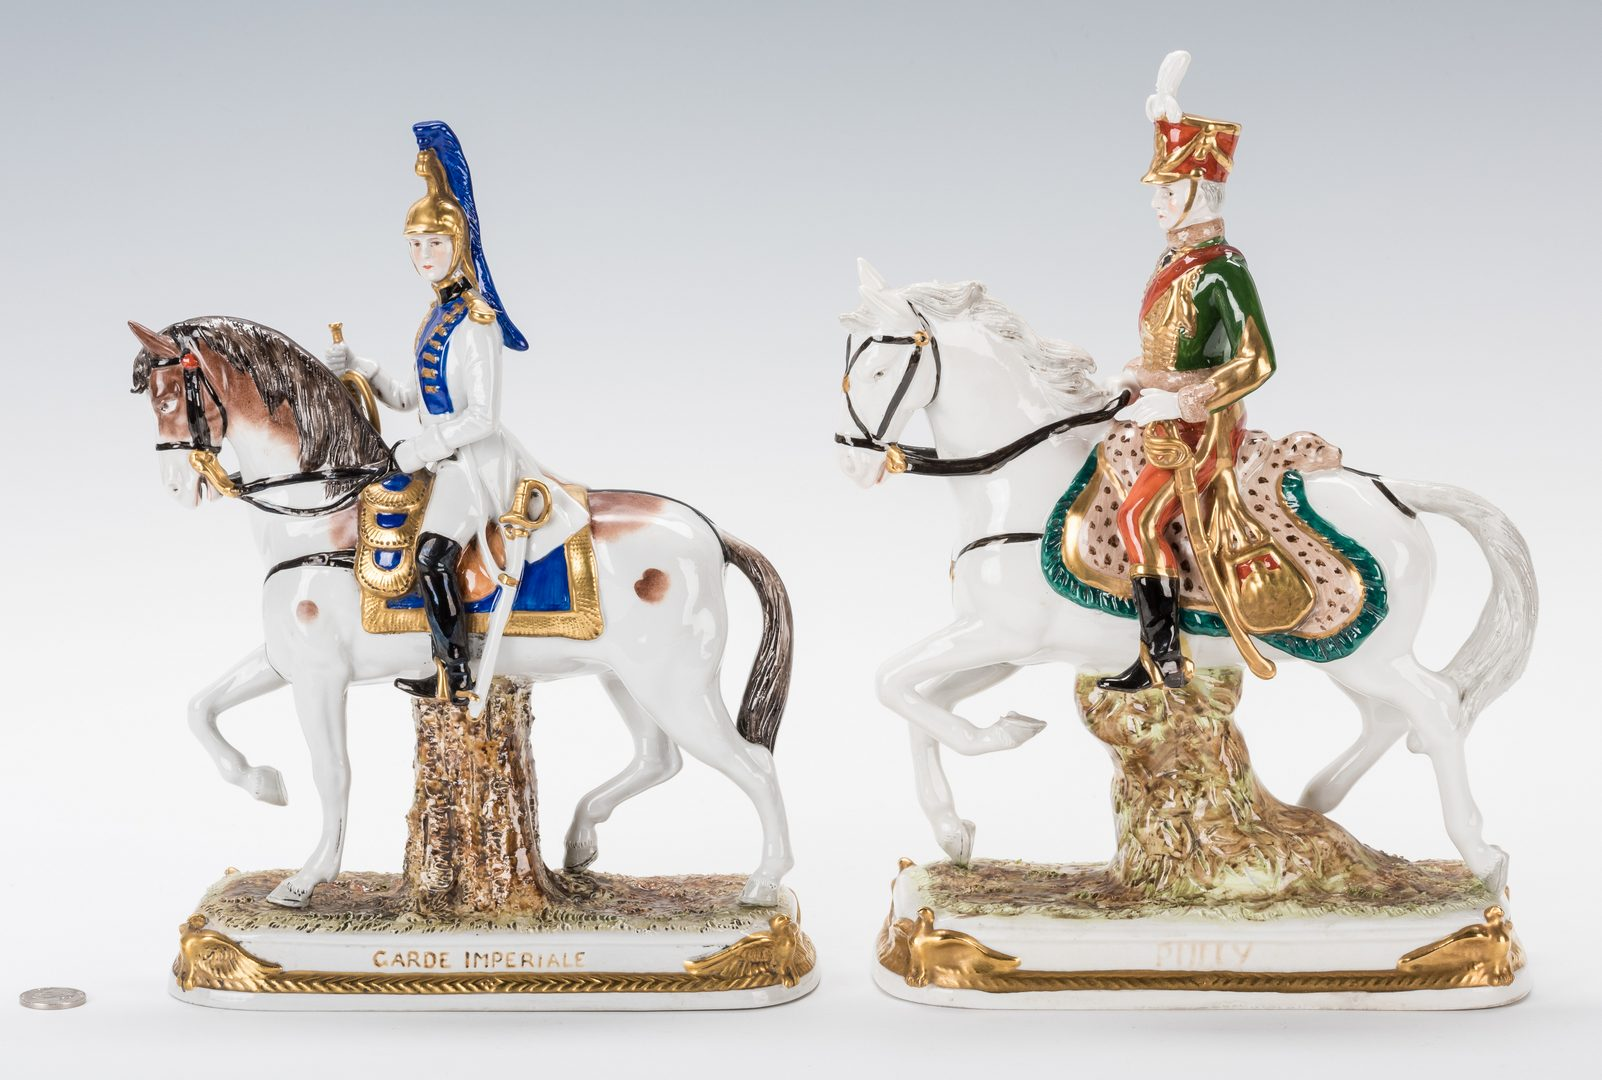 Lot 329: 5 European Military Porcelain Figurines, inc. Capodimonte